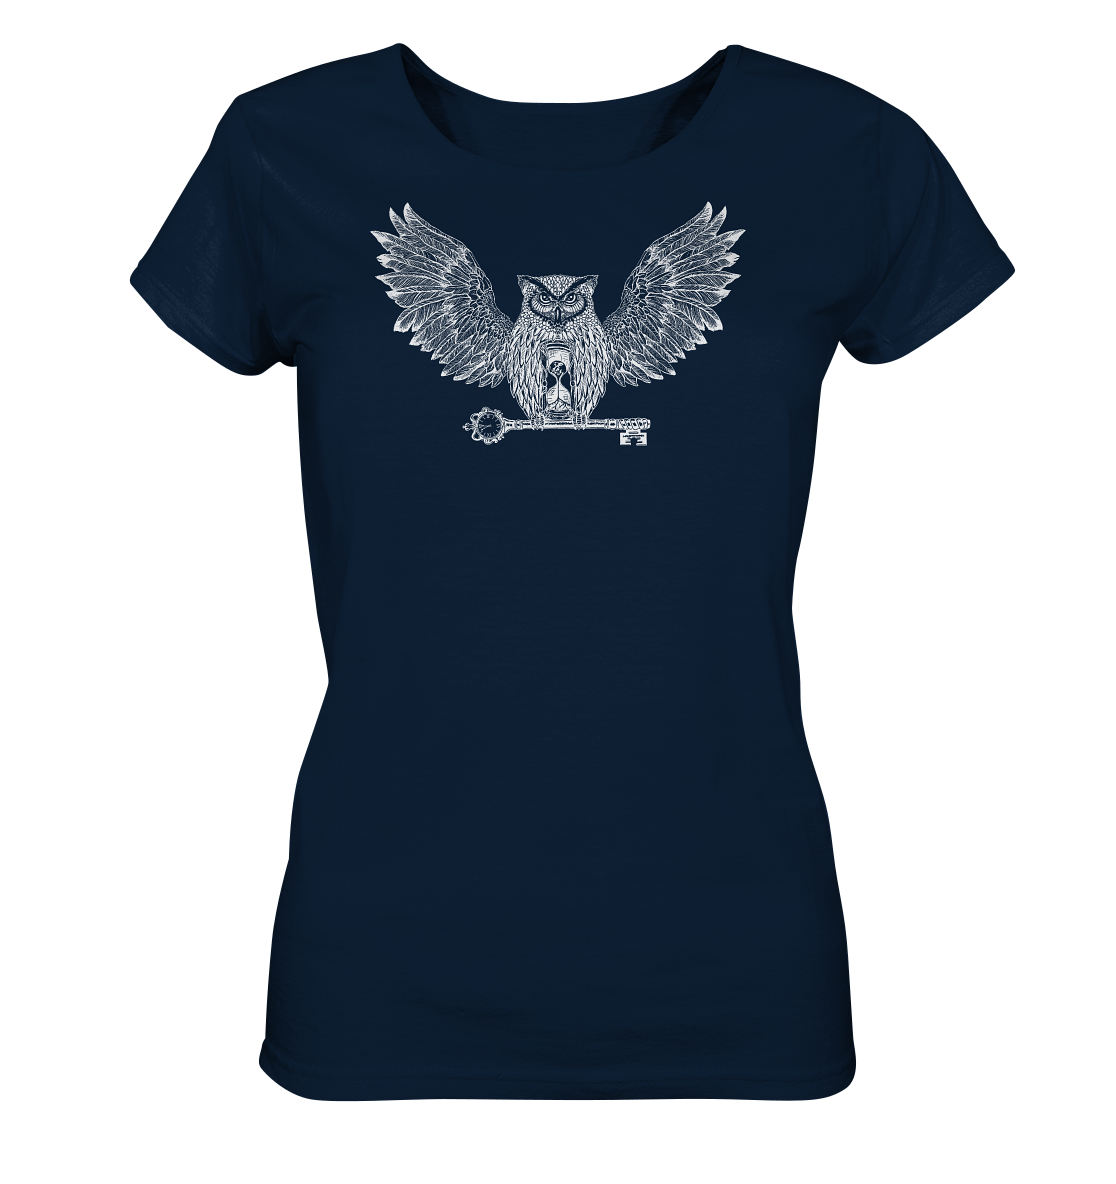 front-ladies-organic-shirt-0e2035-1116x-4.png